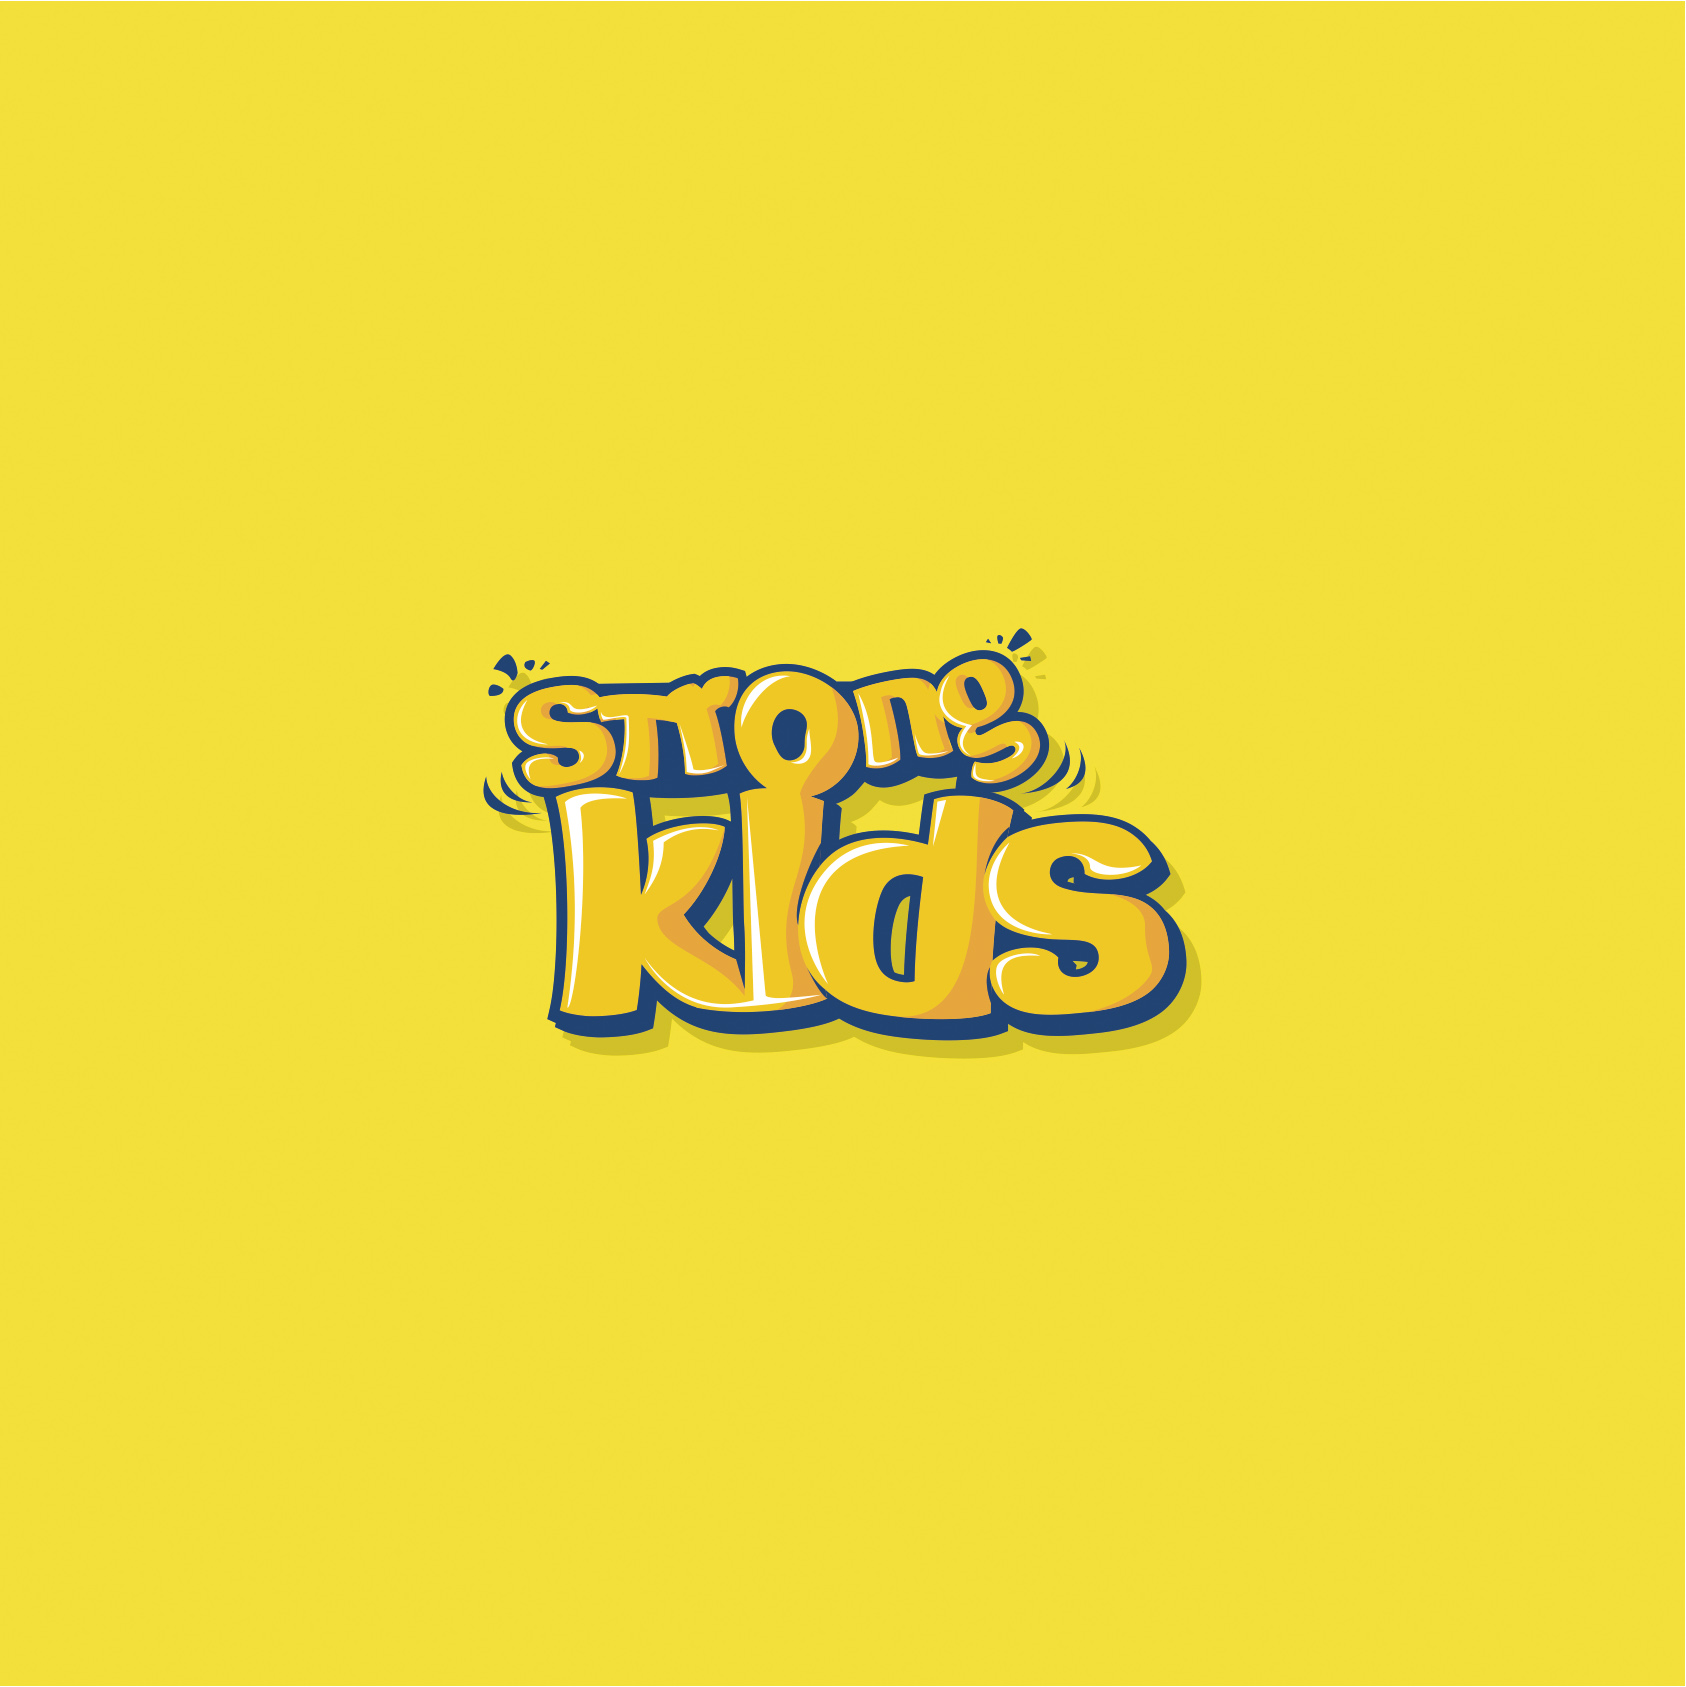 Логотип для Детского Интернет Магазина StrongKids фото f_9835c653f447f718.jpg